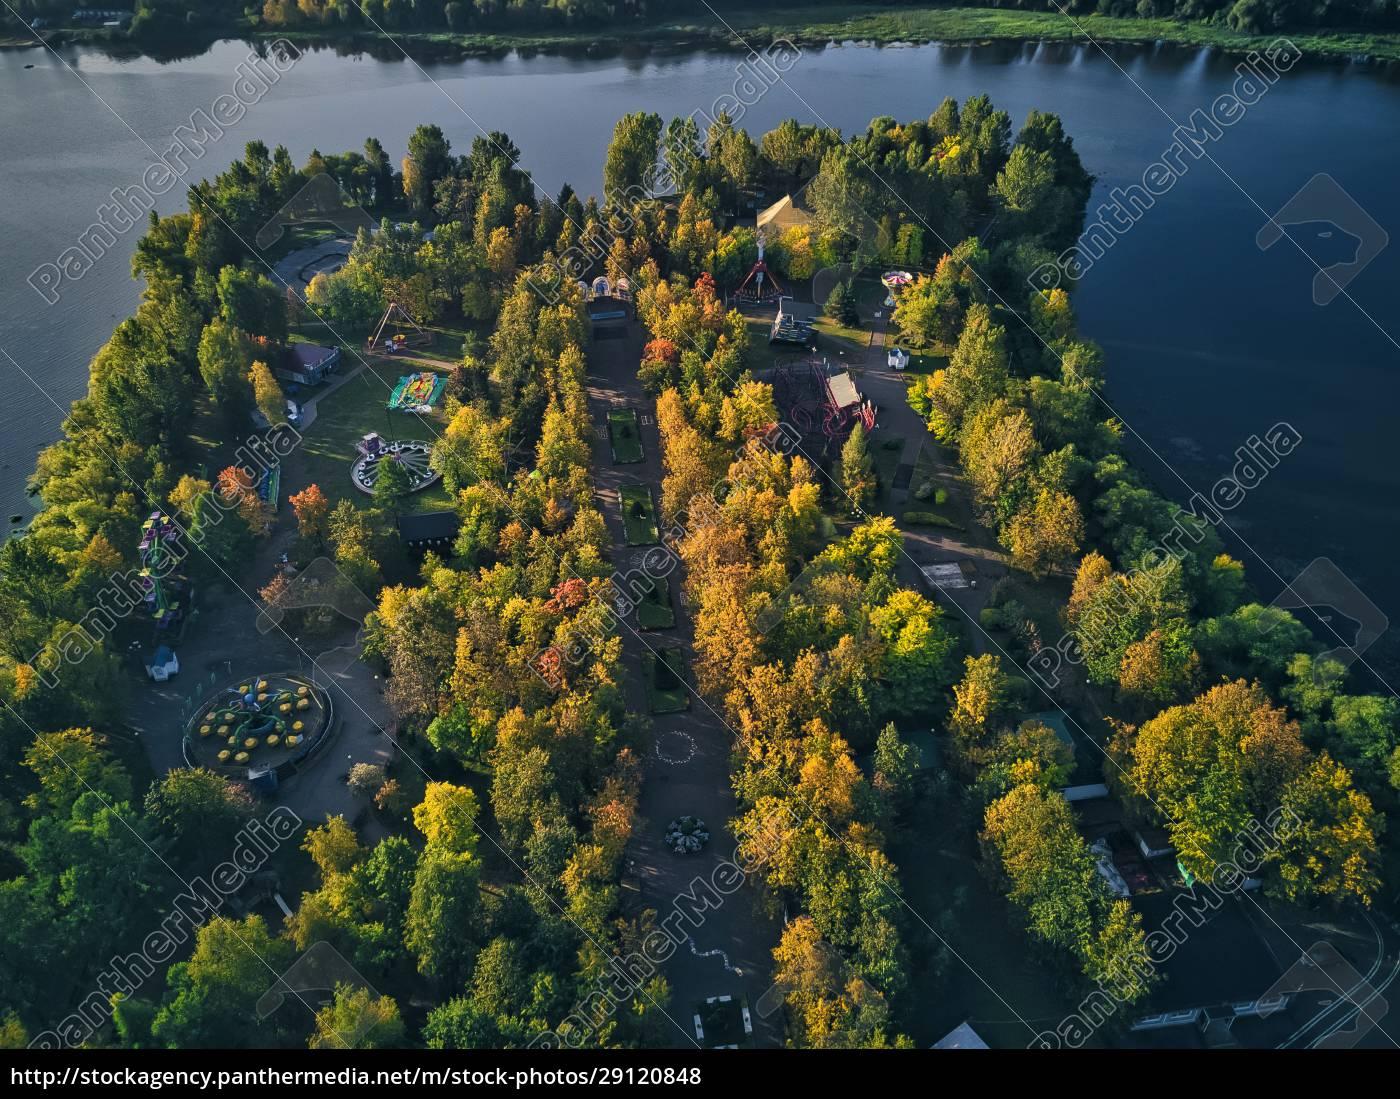 trees, at, amusement, park, by, kotorosl - 29120848